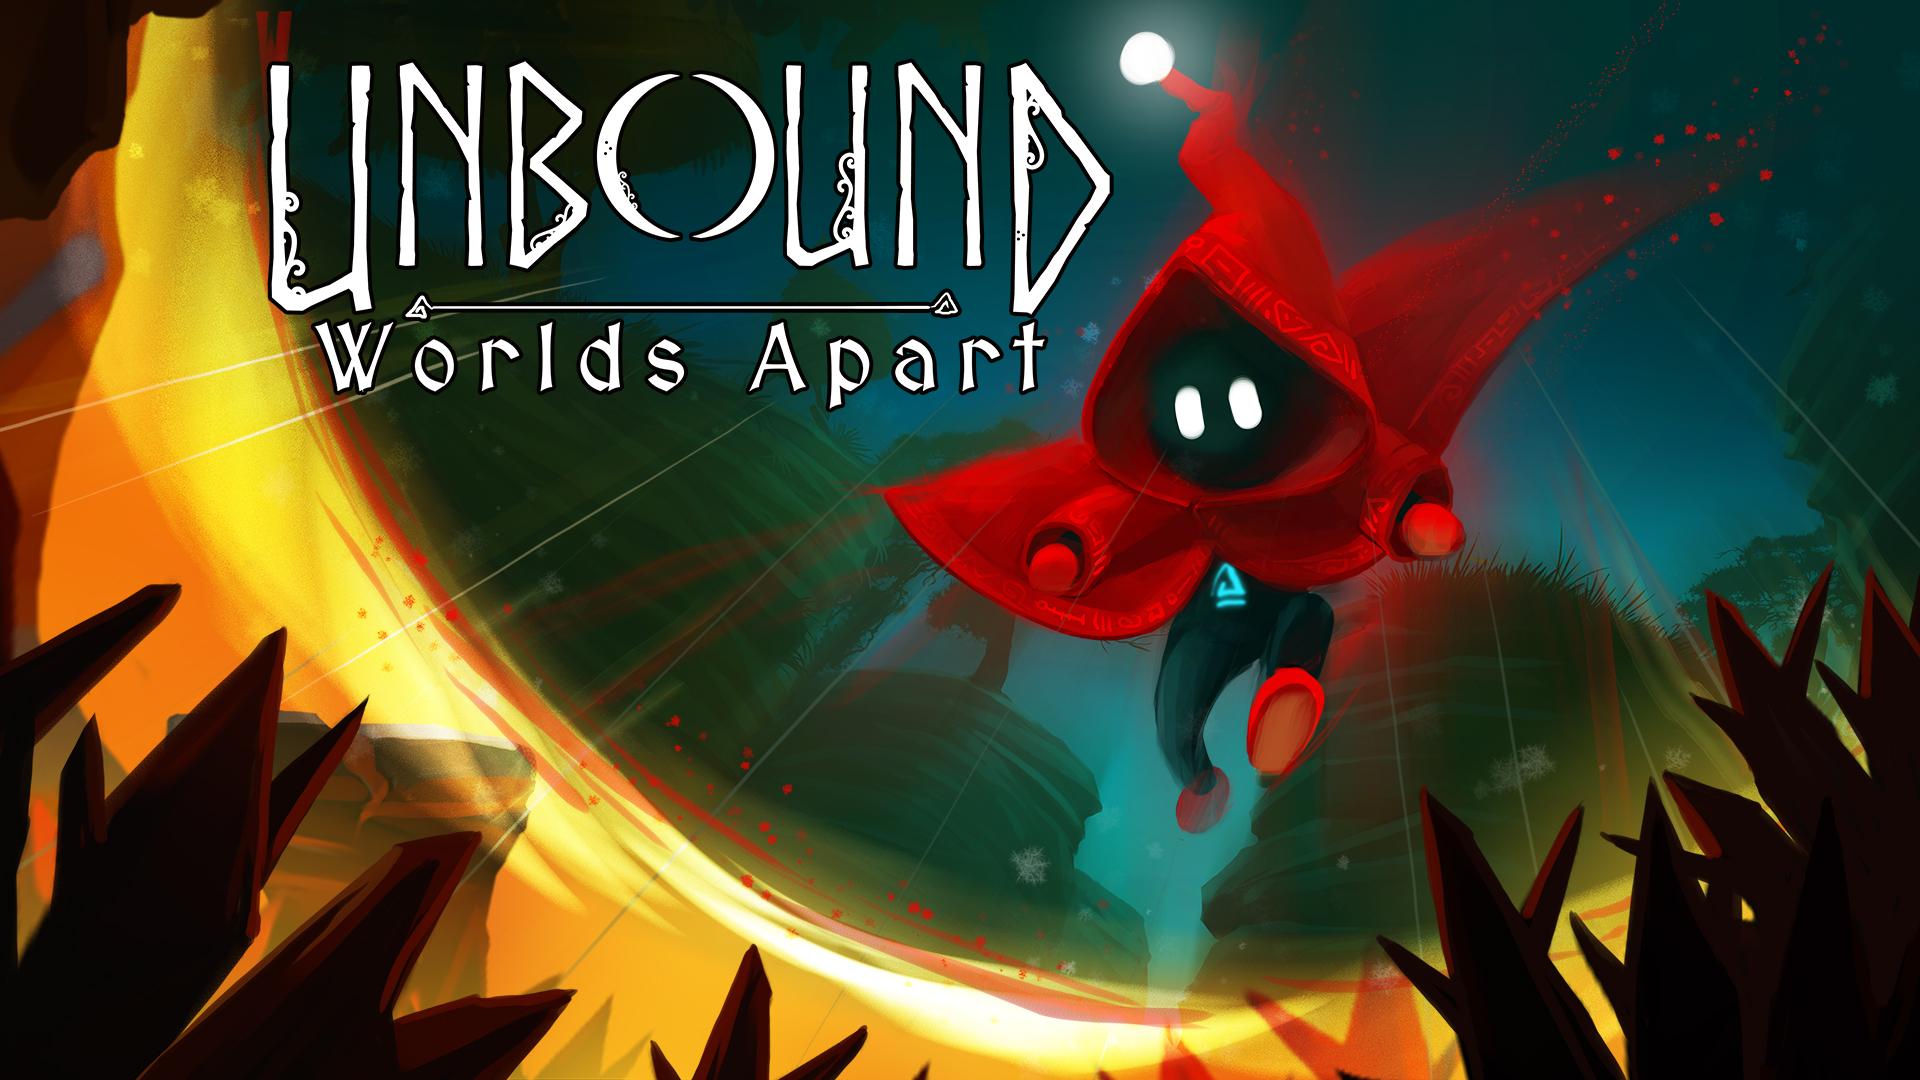 Alien Pixel Studios lansează anul acesta Unbound Worlds Apart